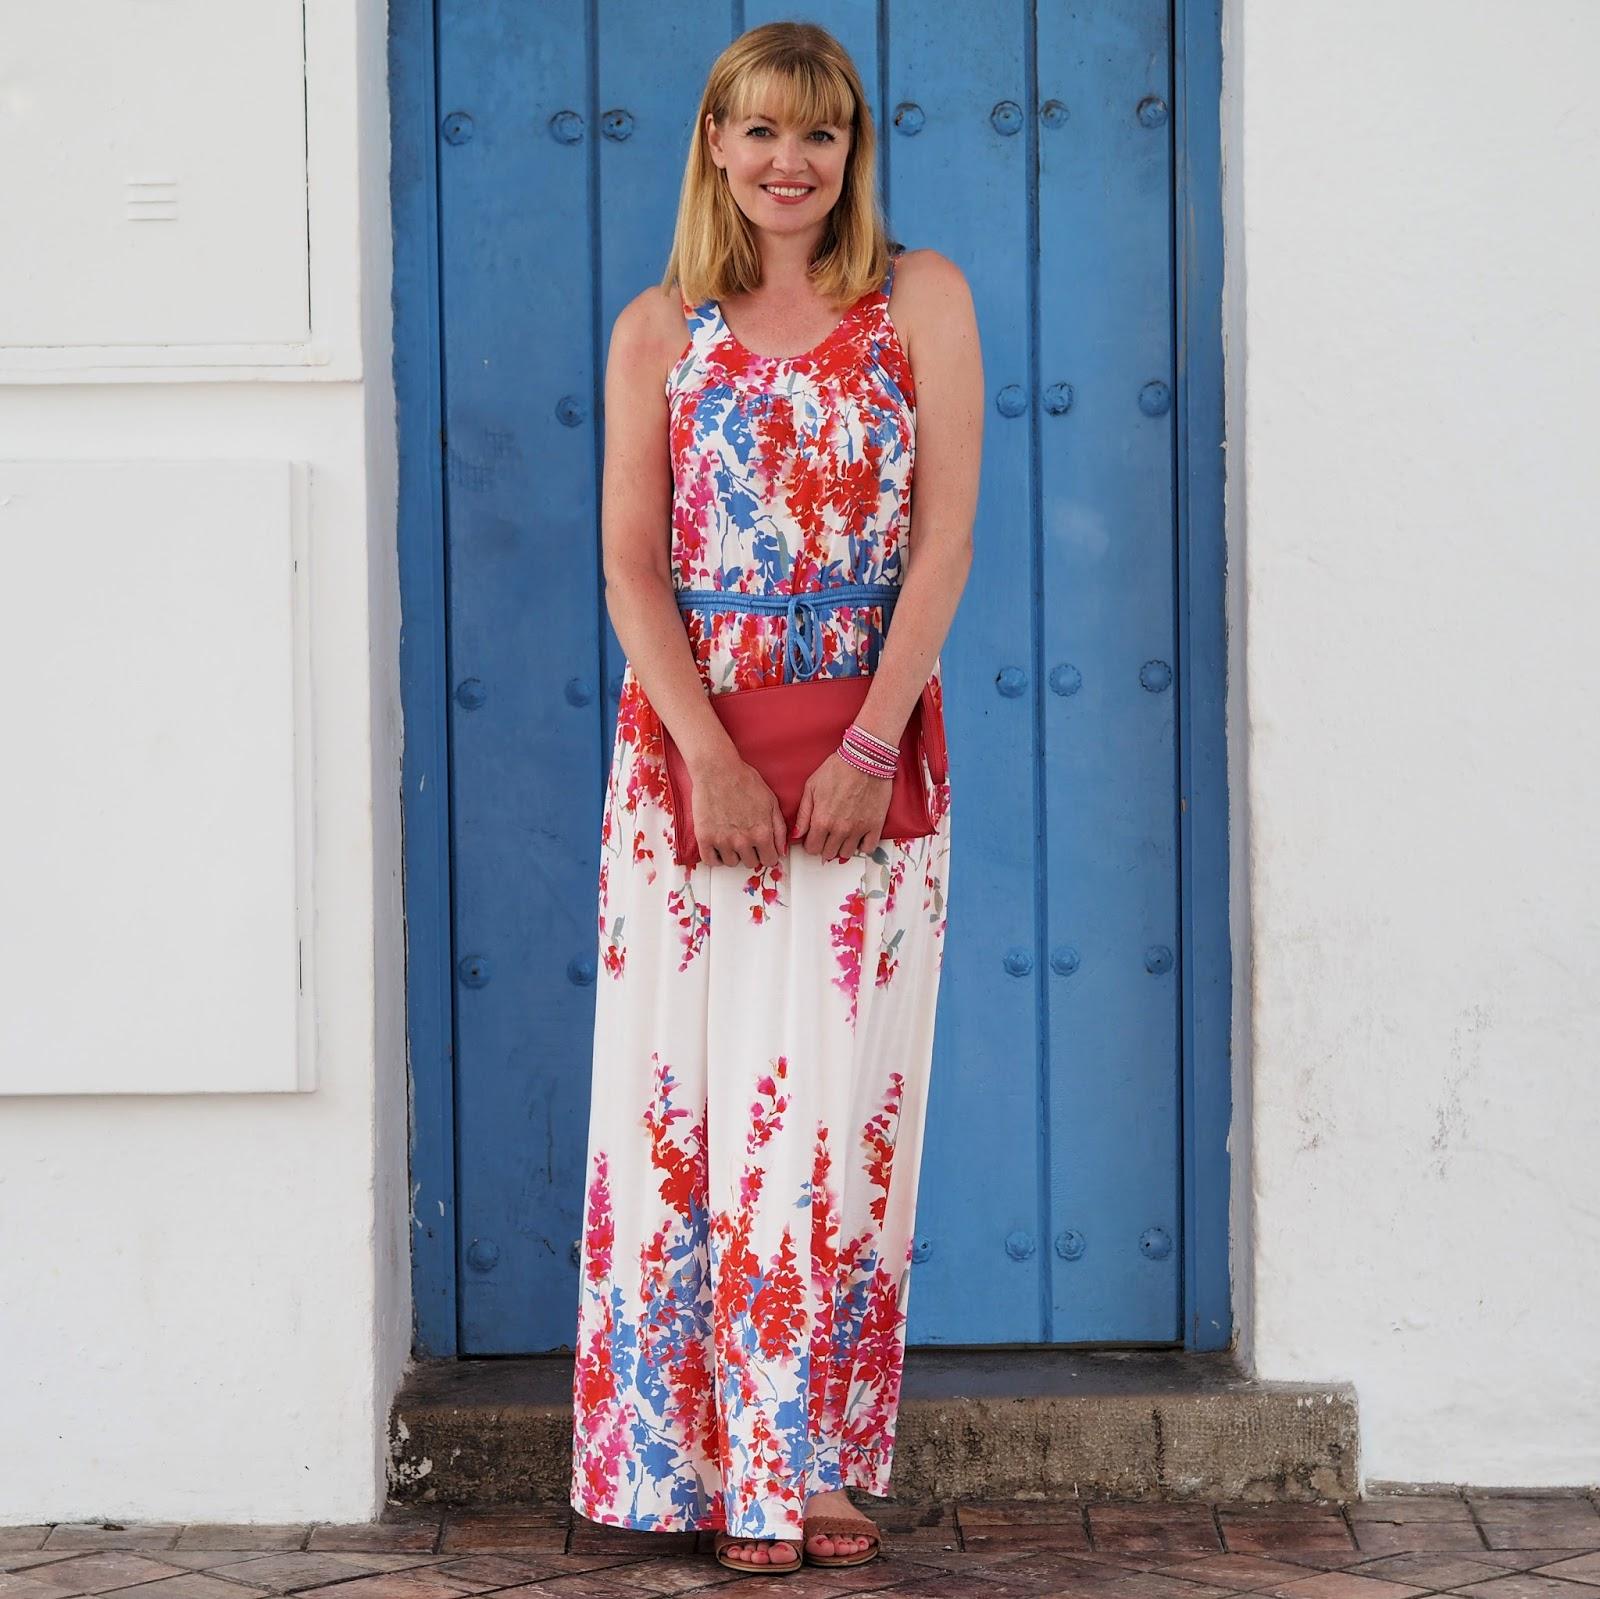 Braintree eco-fashion multi-coloured floral maxi dress. Nerja